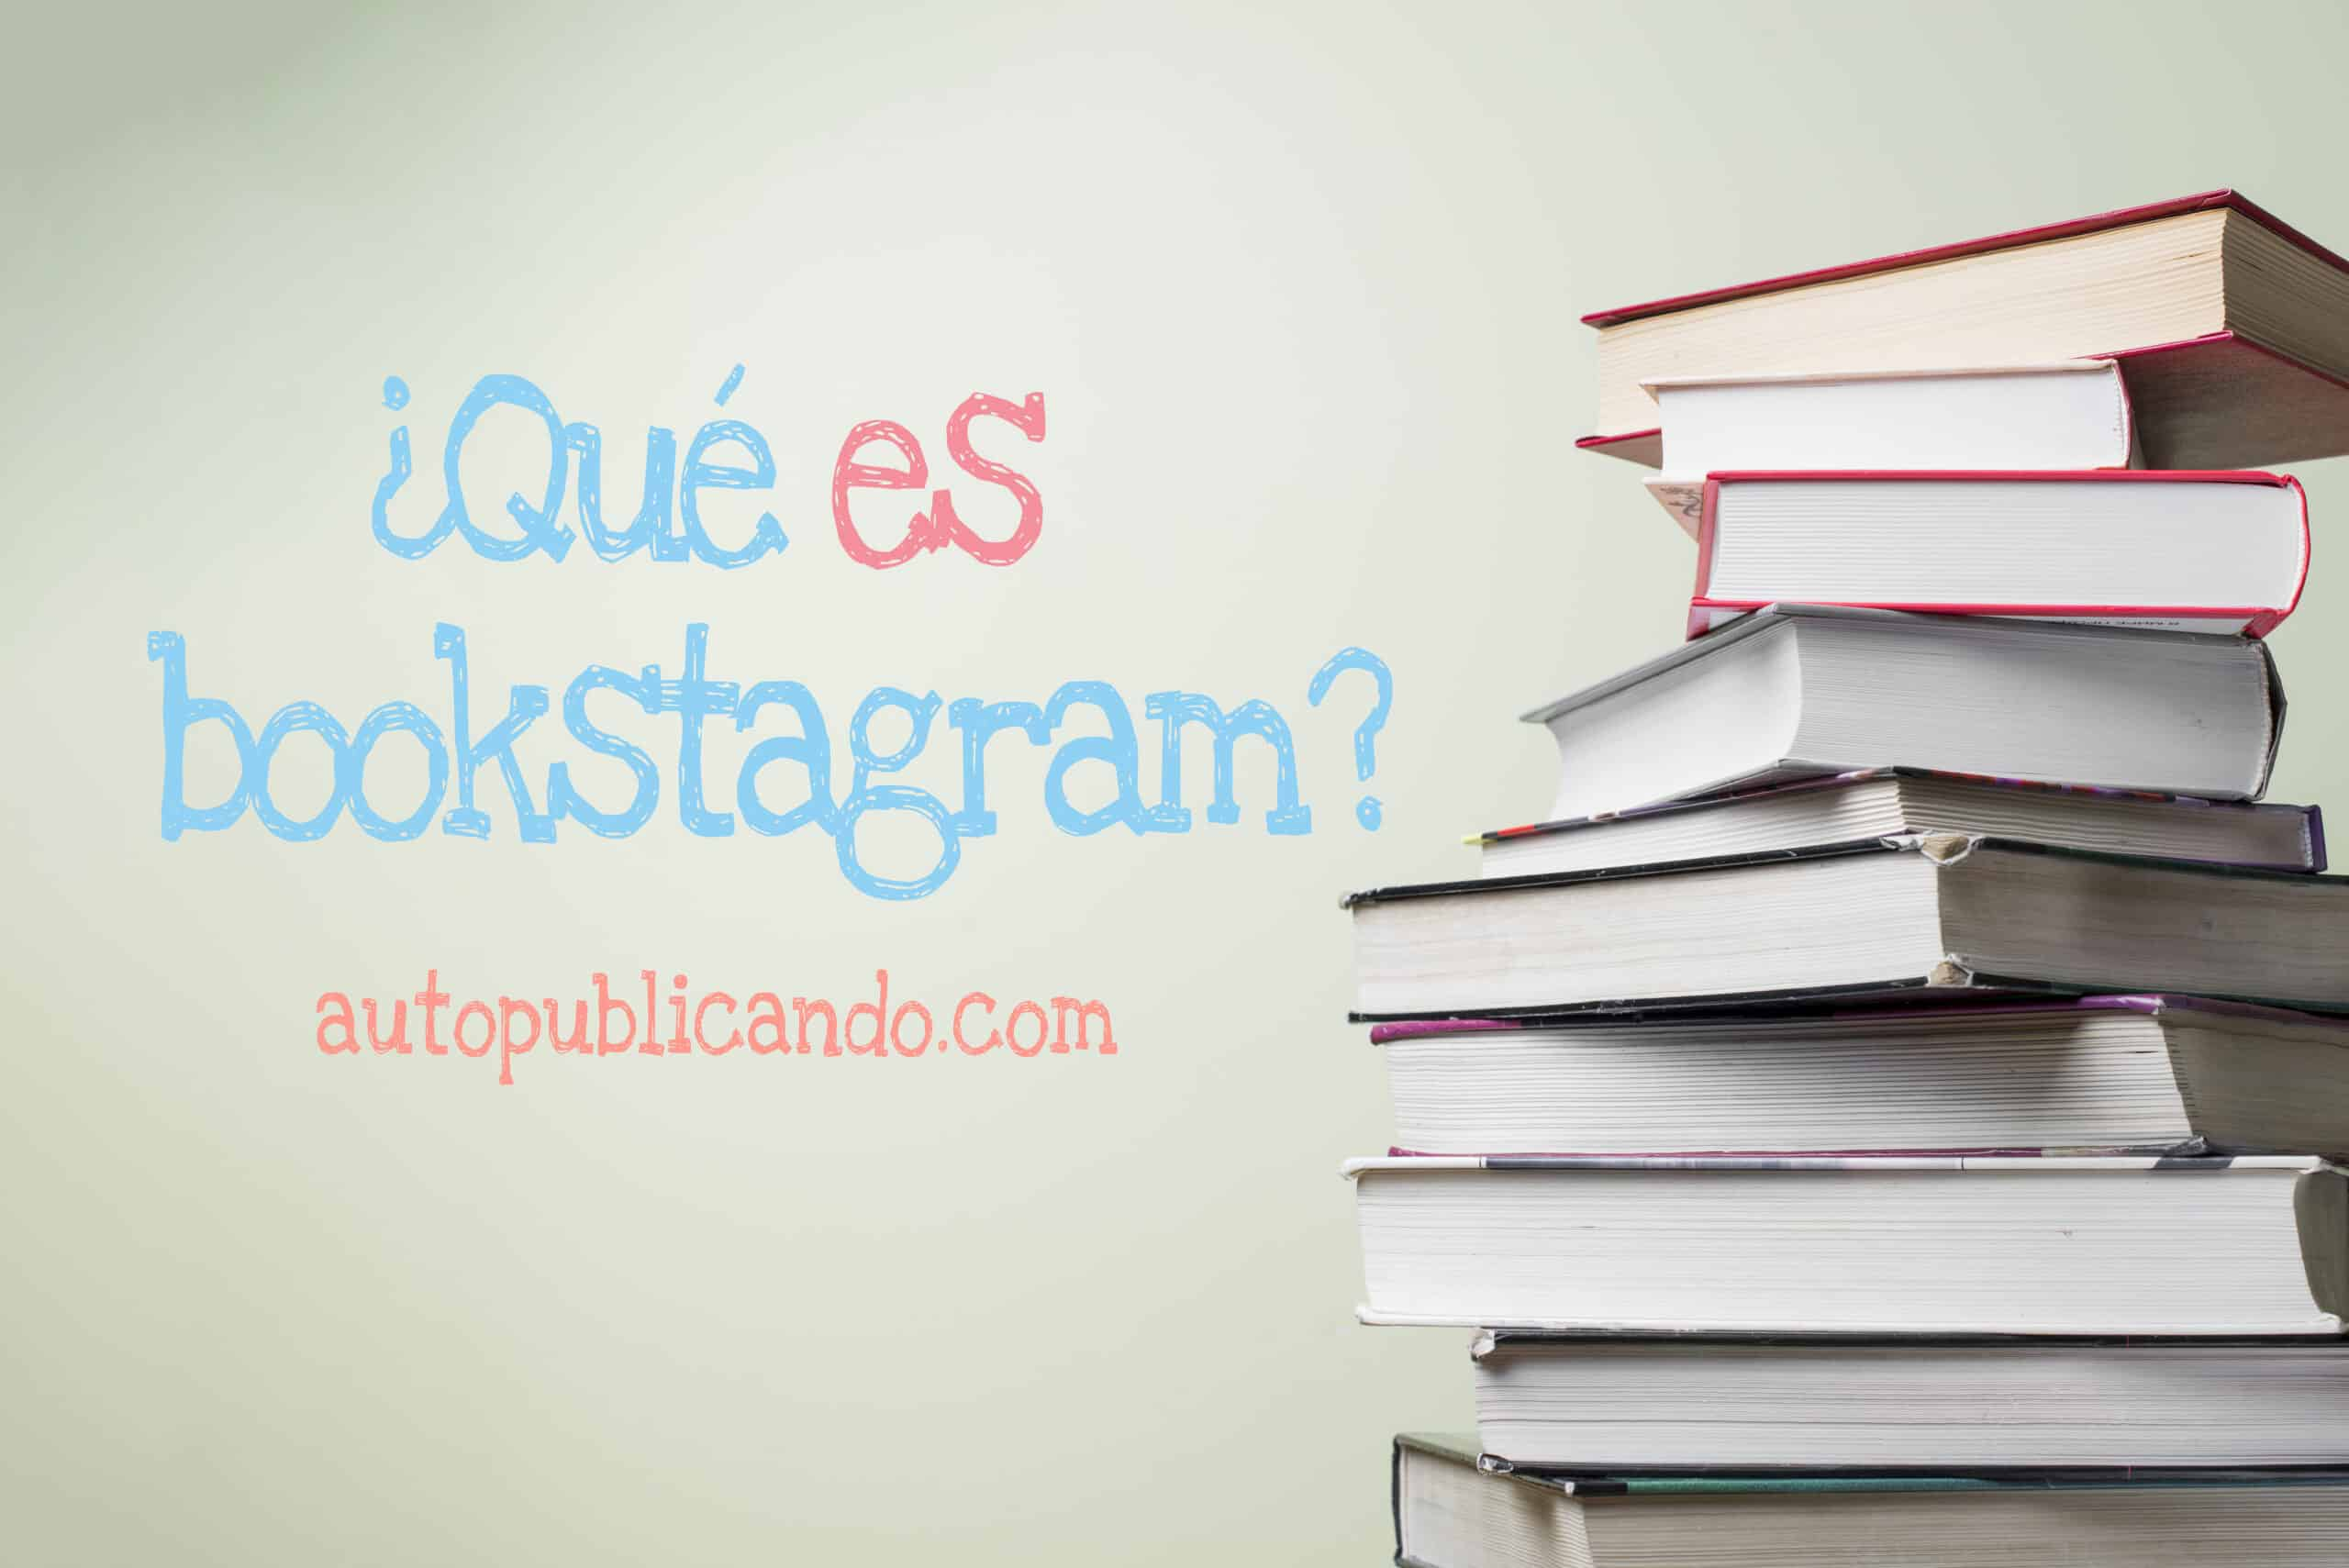 ¿Qué es bookstagram?